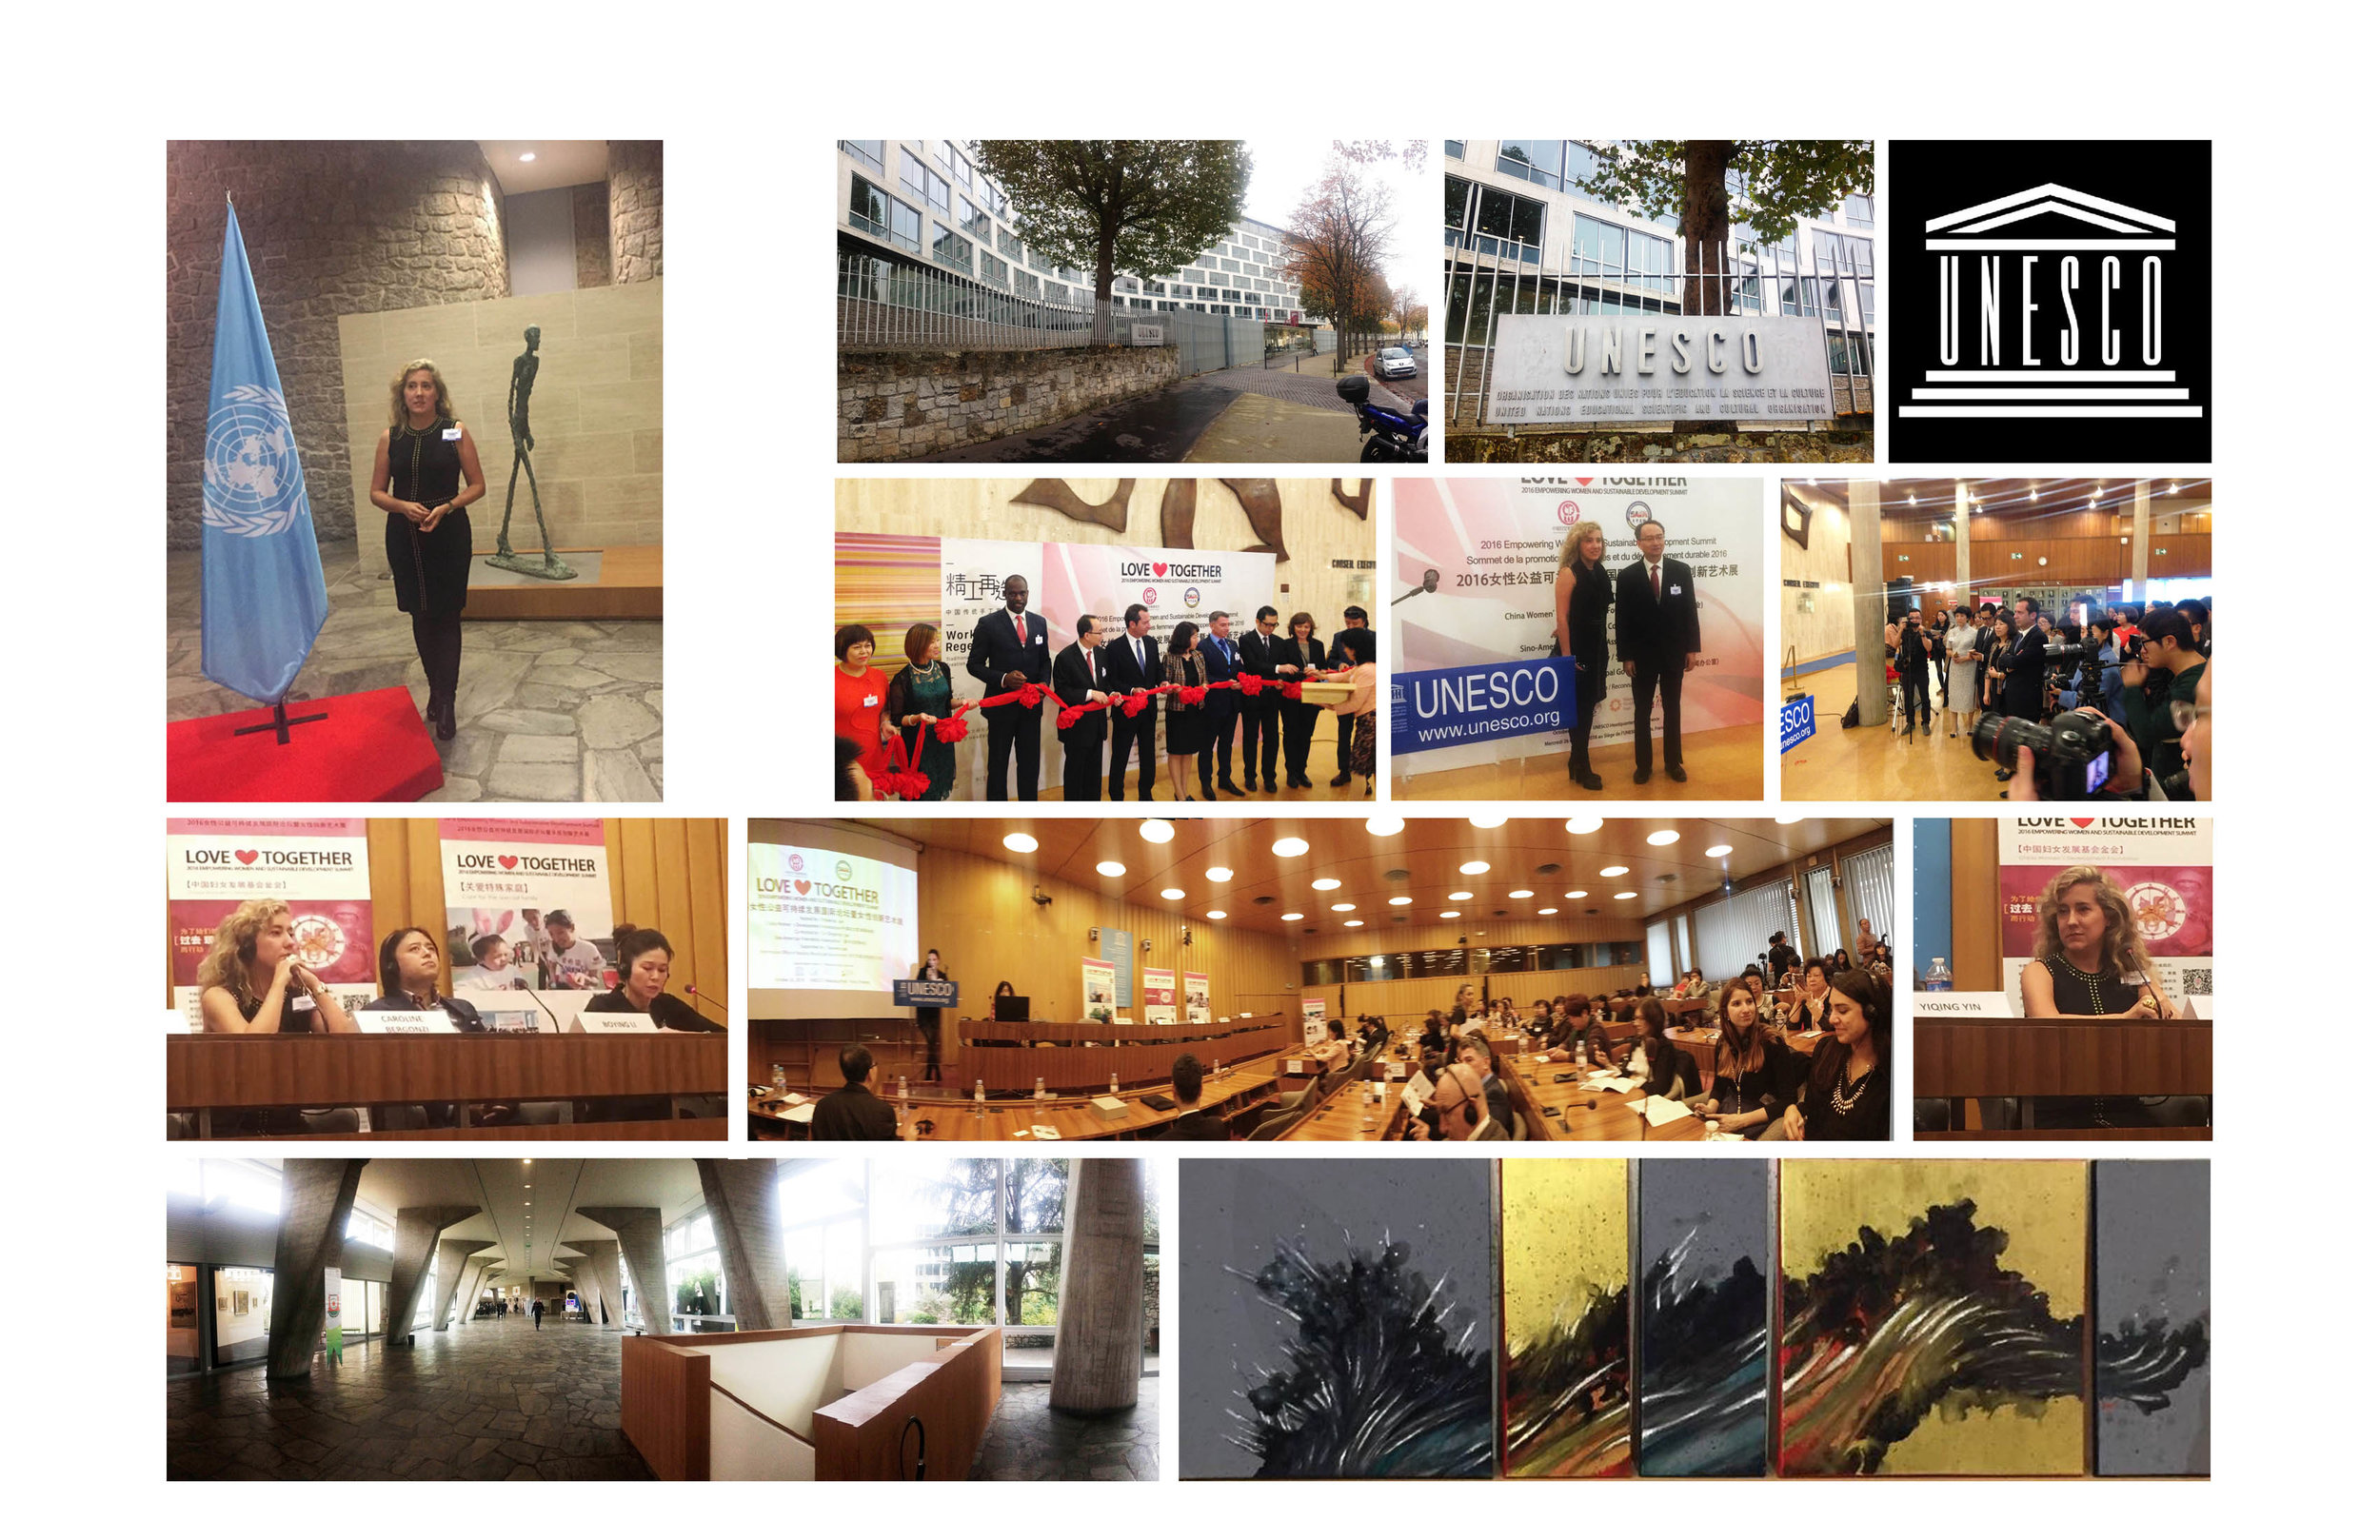 Caroline_Bergonzi__Event_UNESCO.jpg